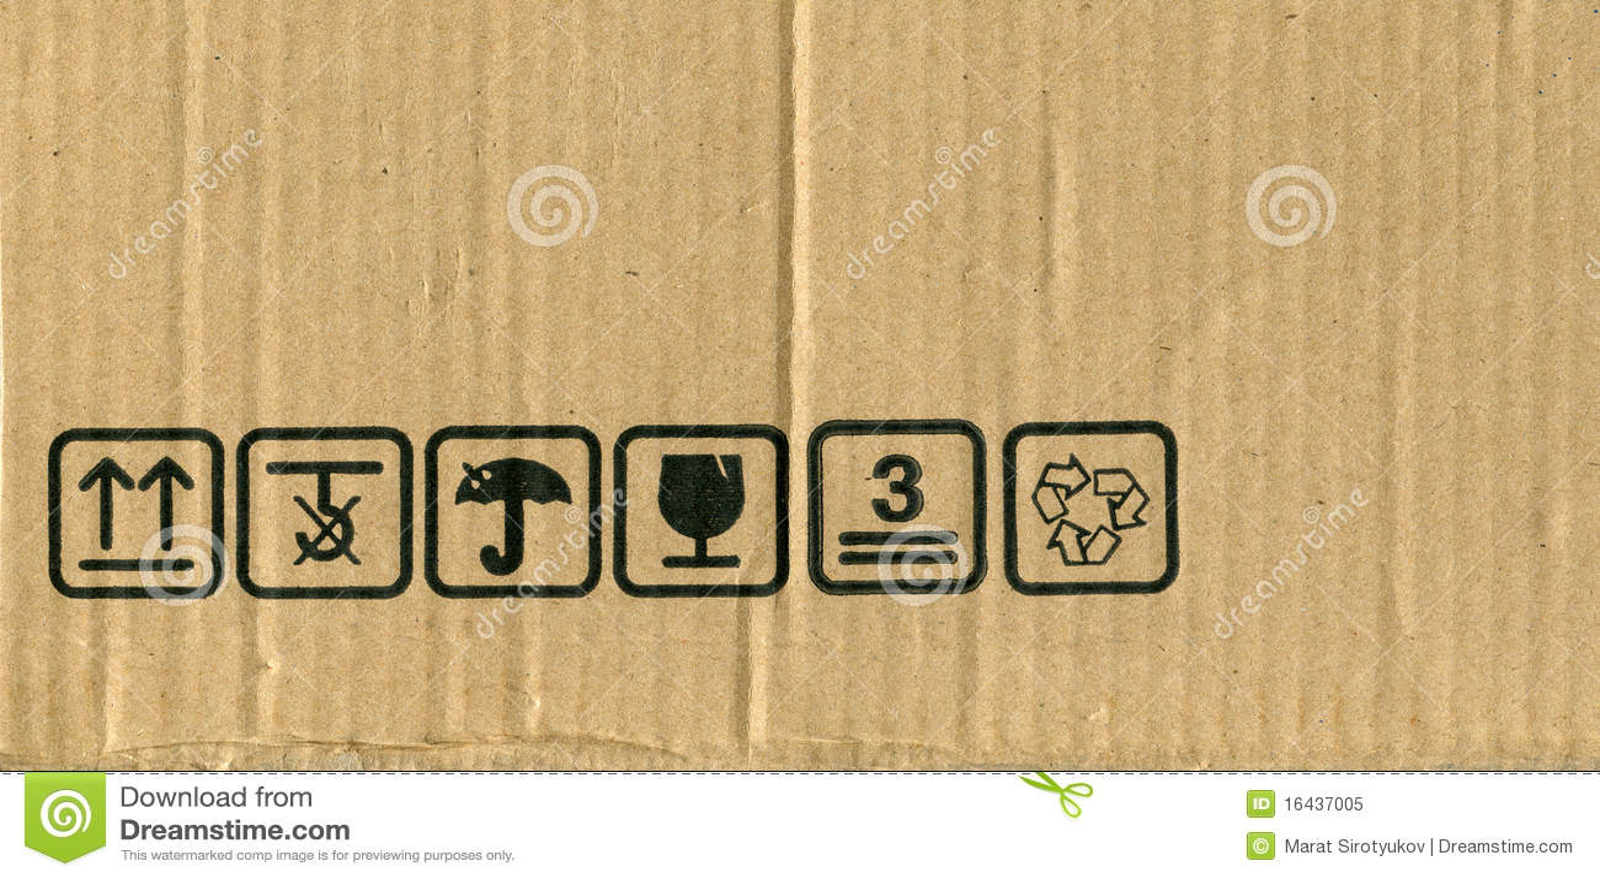 Cardboard box symbols stock photos 193 images biocorpaavc Choice Image